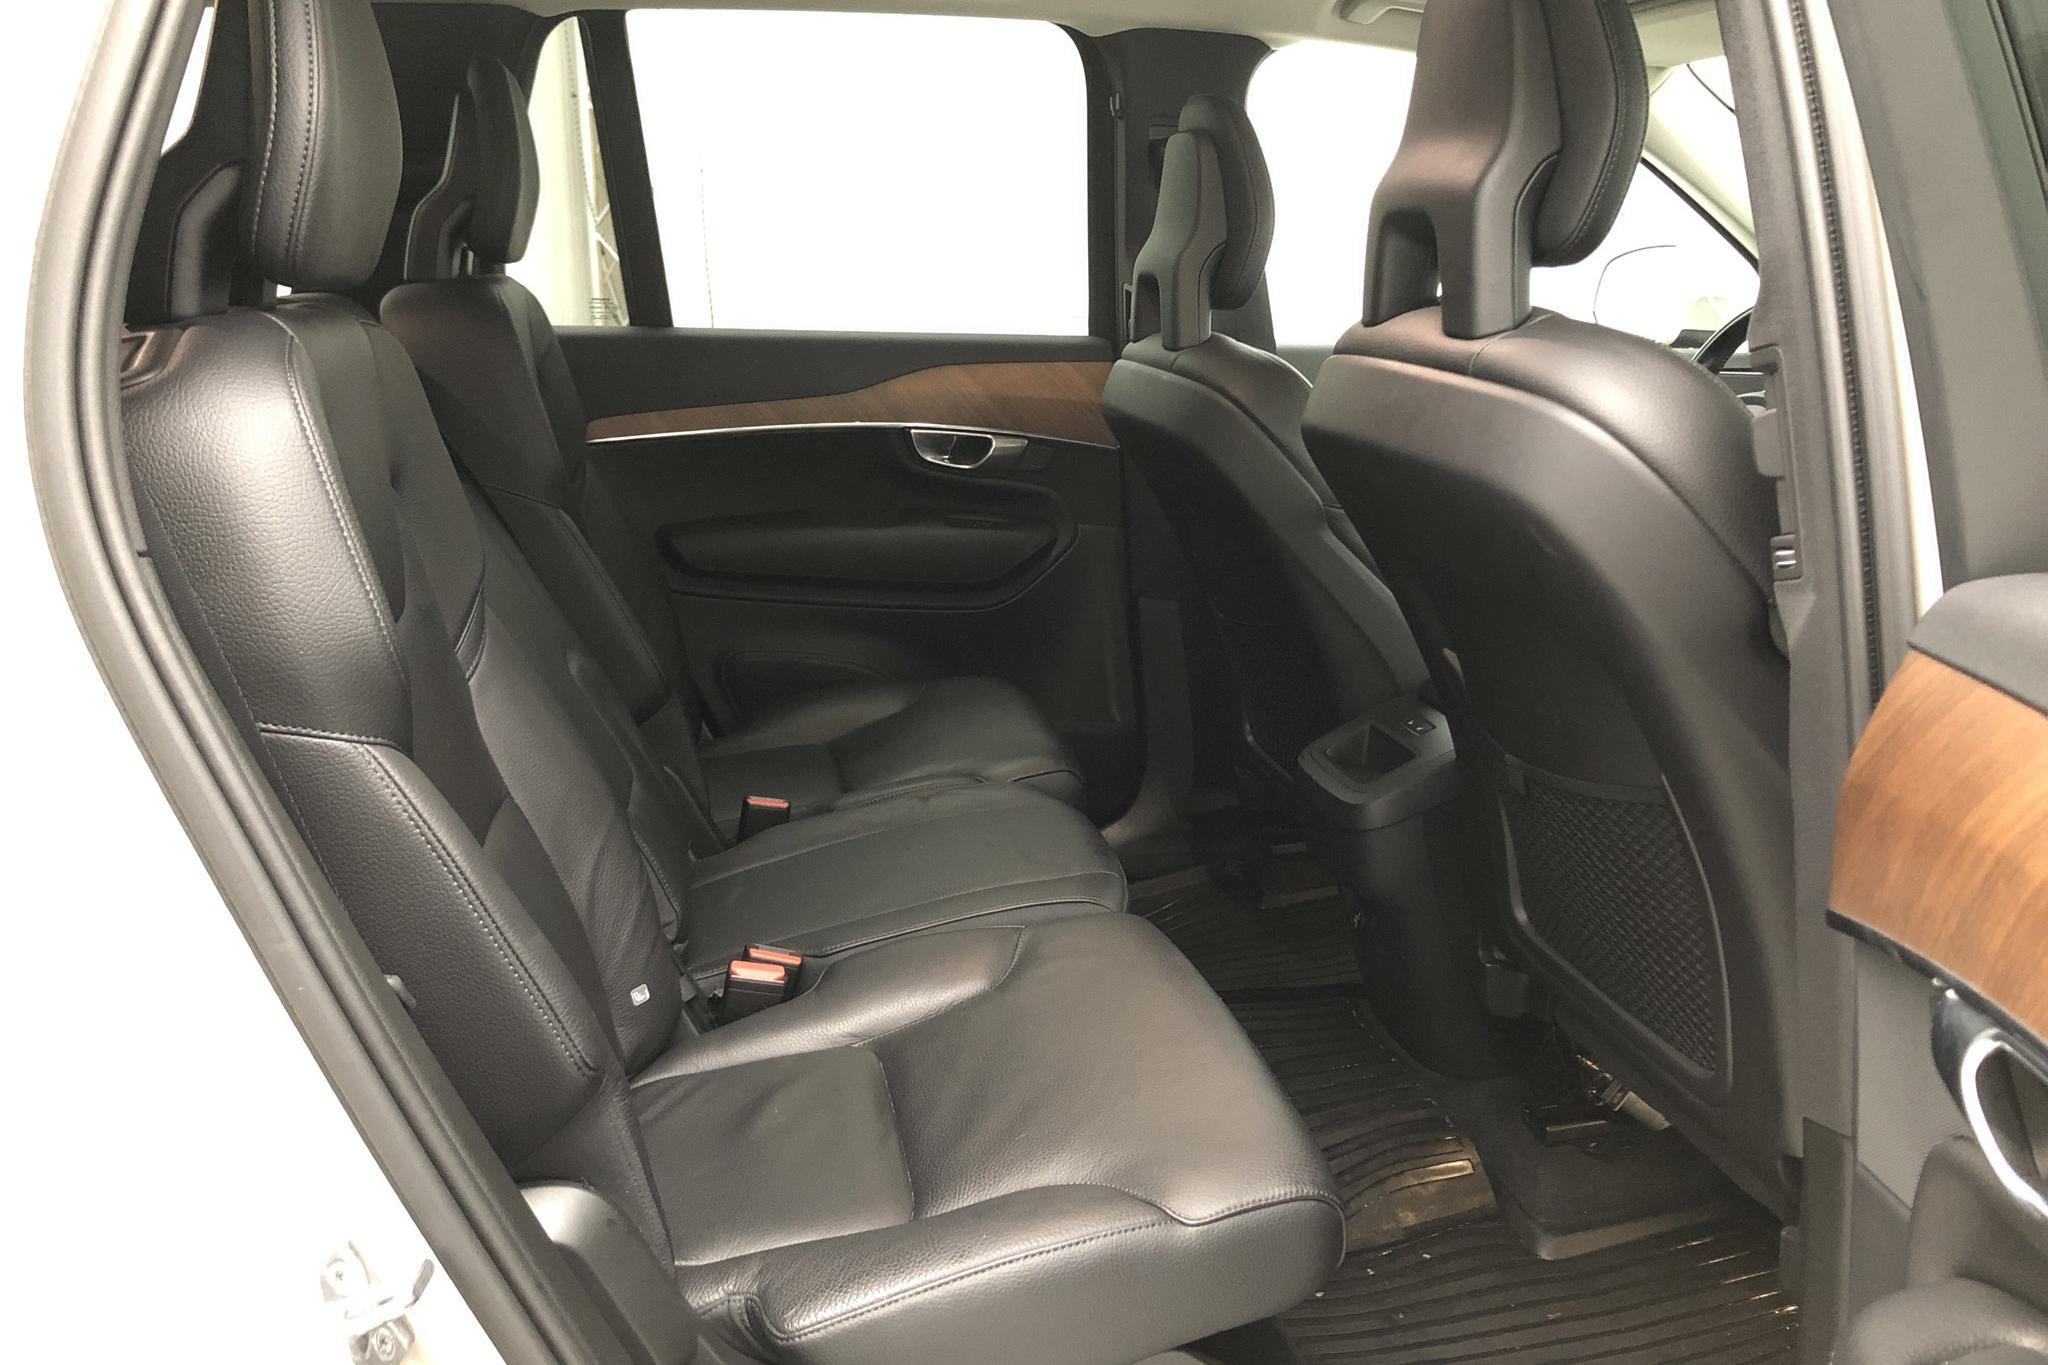 Volvo XC90 D5 AWD 7 sits Inscription (235hk) - 55 000 km - Automatic - Light Brown - 2018